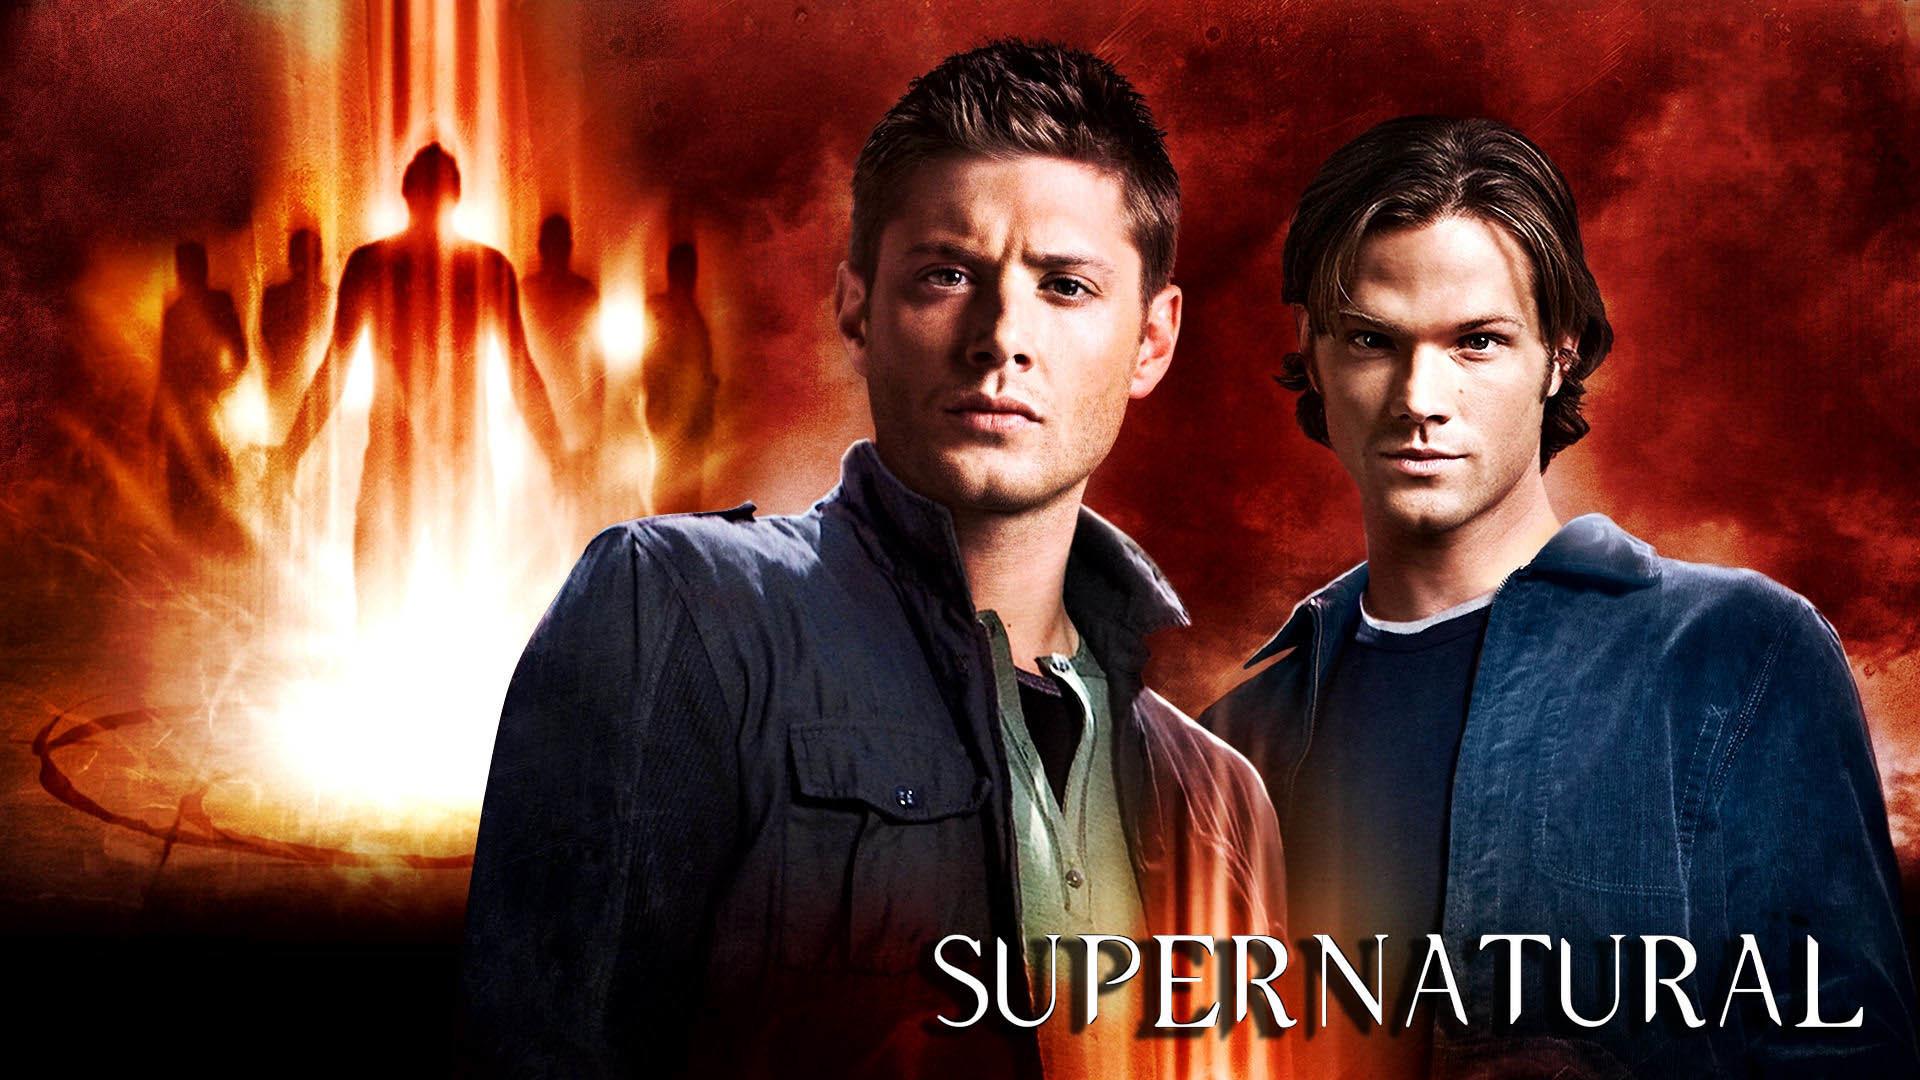 supernatural season 2 all episodes download